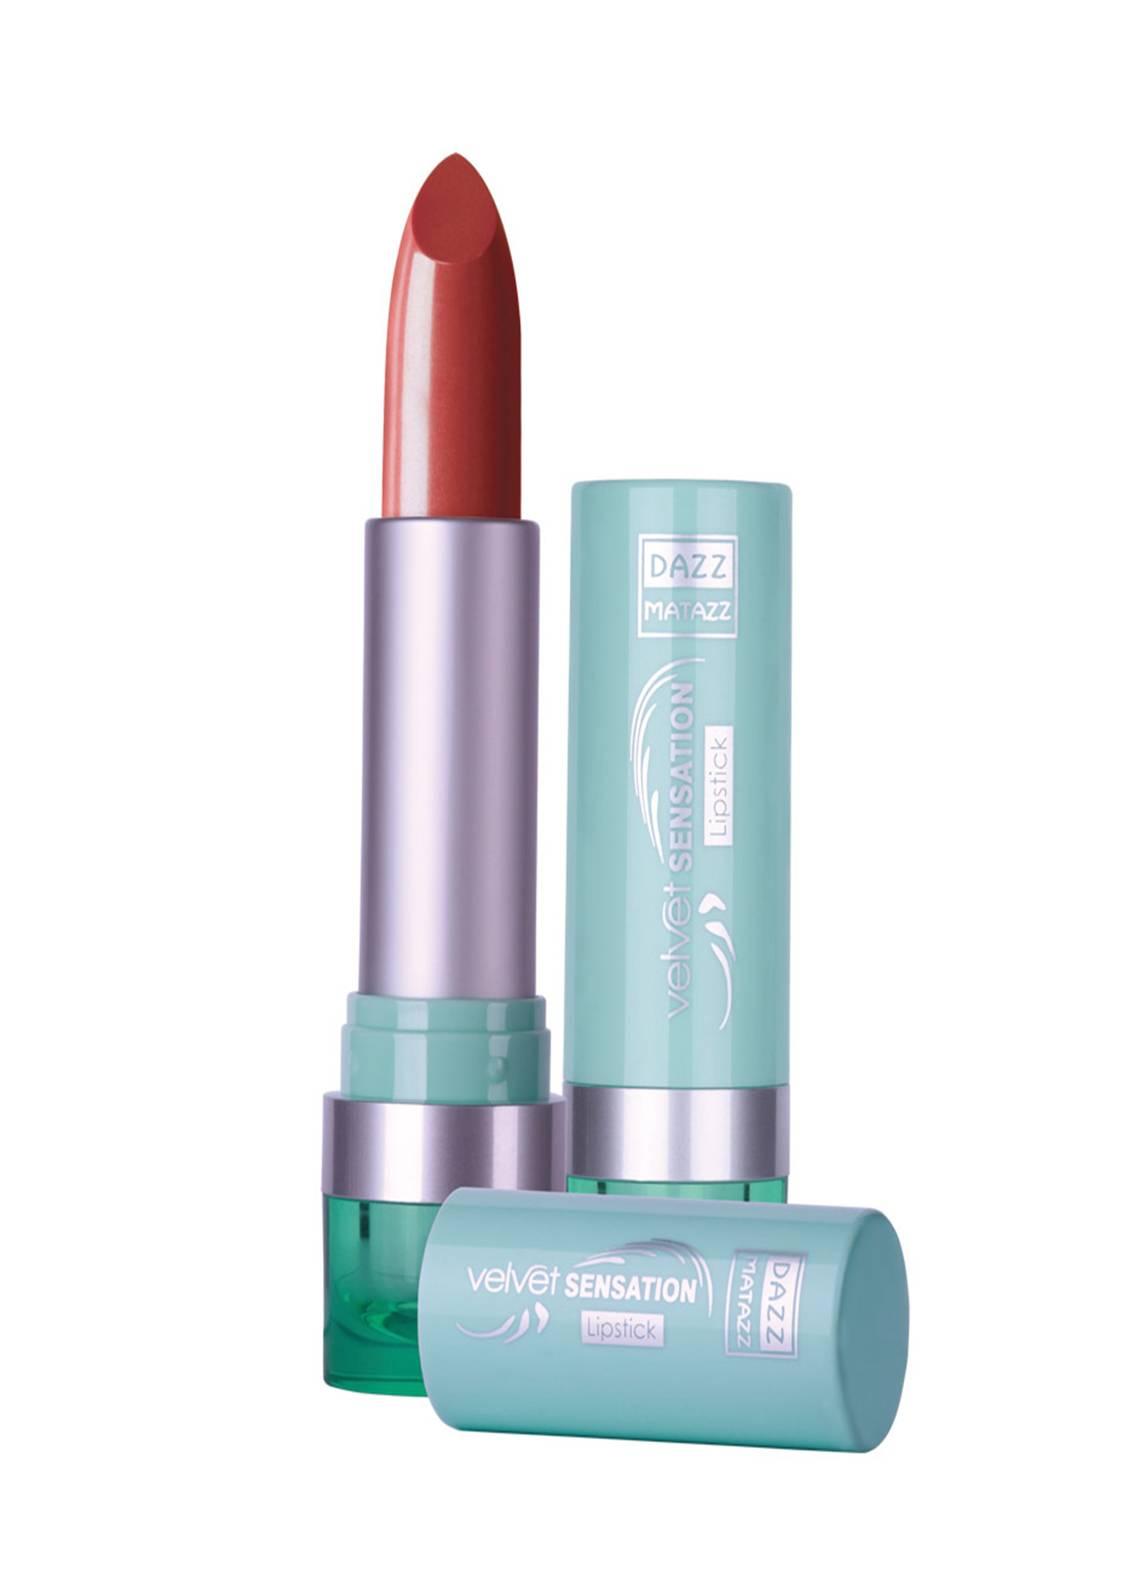 Dazz Matazz Velvet Sensation Lipstick-09 VANILLA CHERRY FUDGE